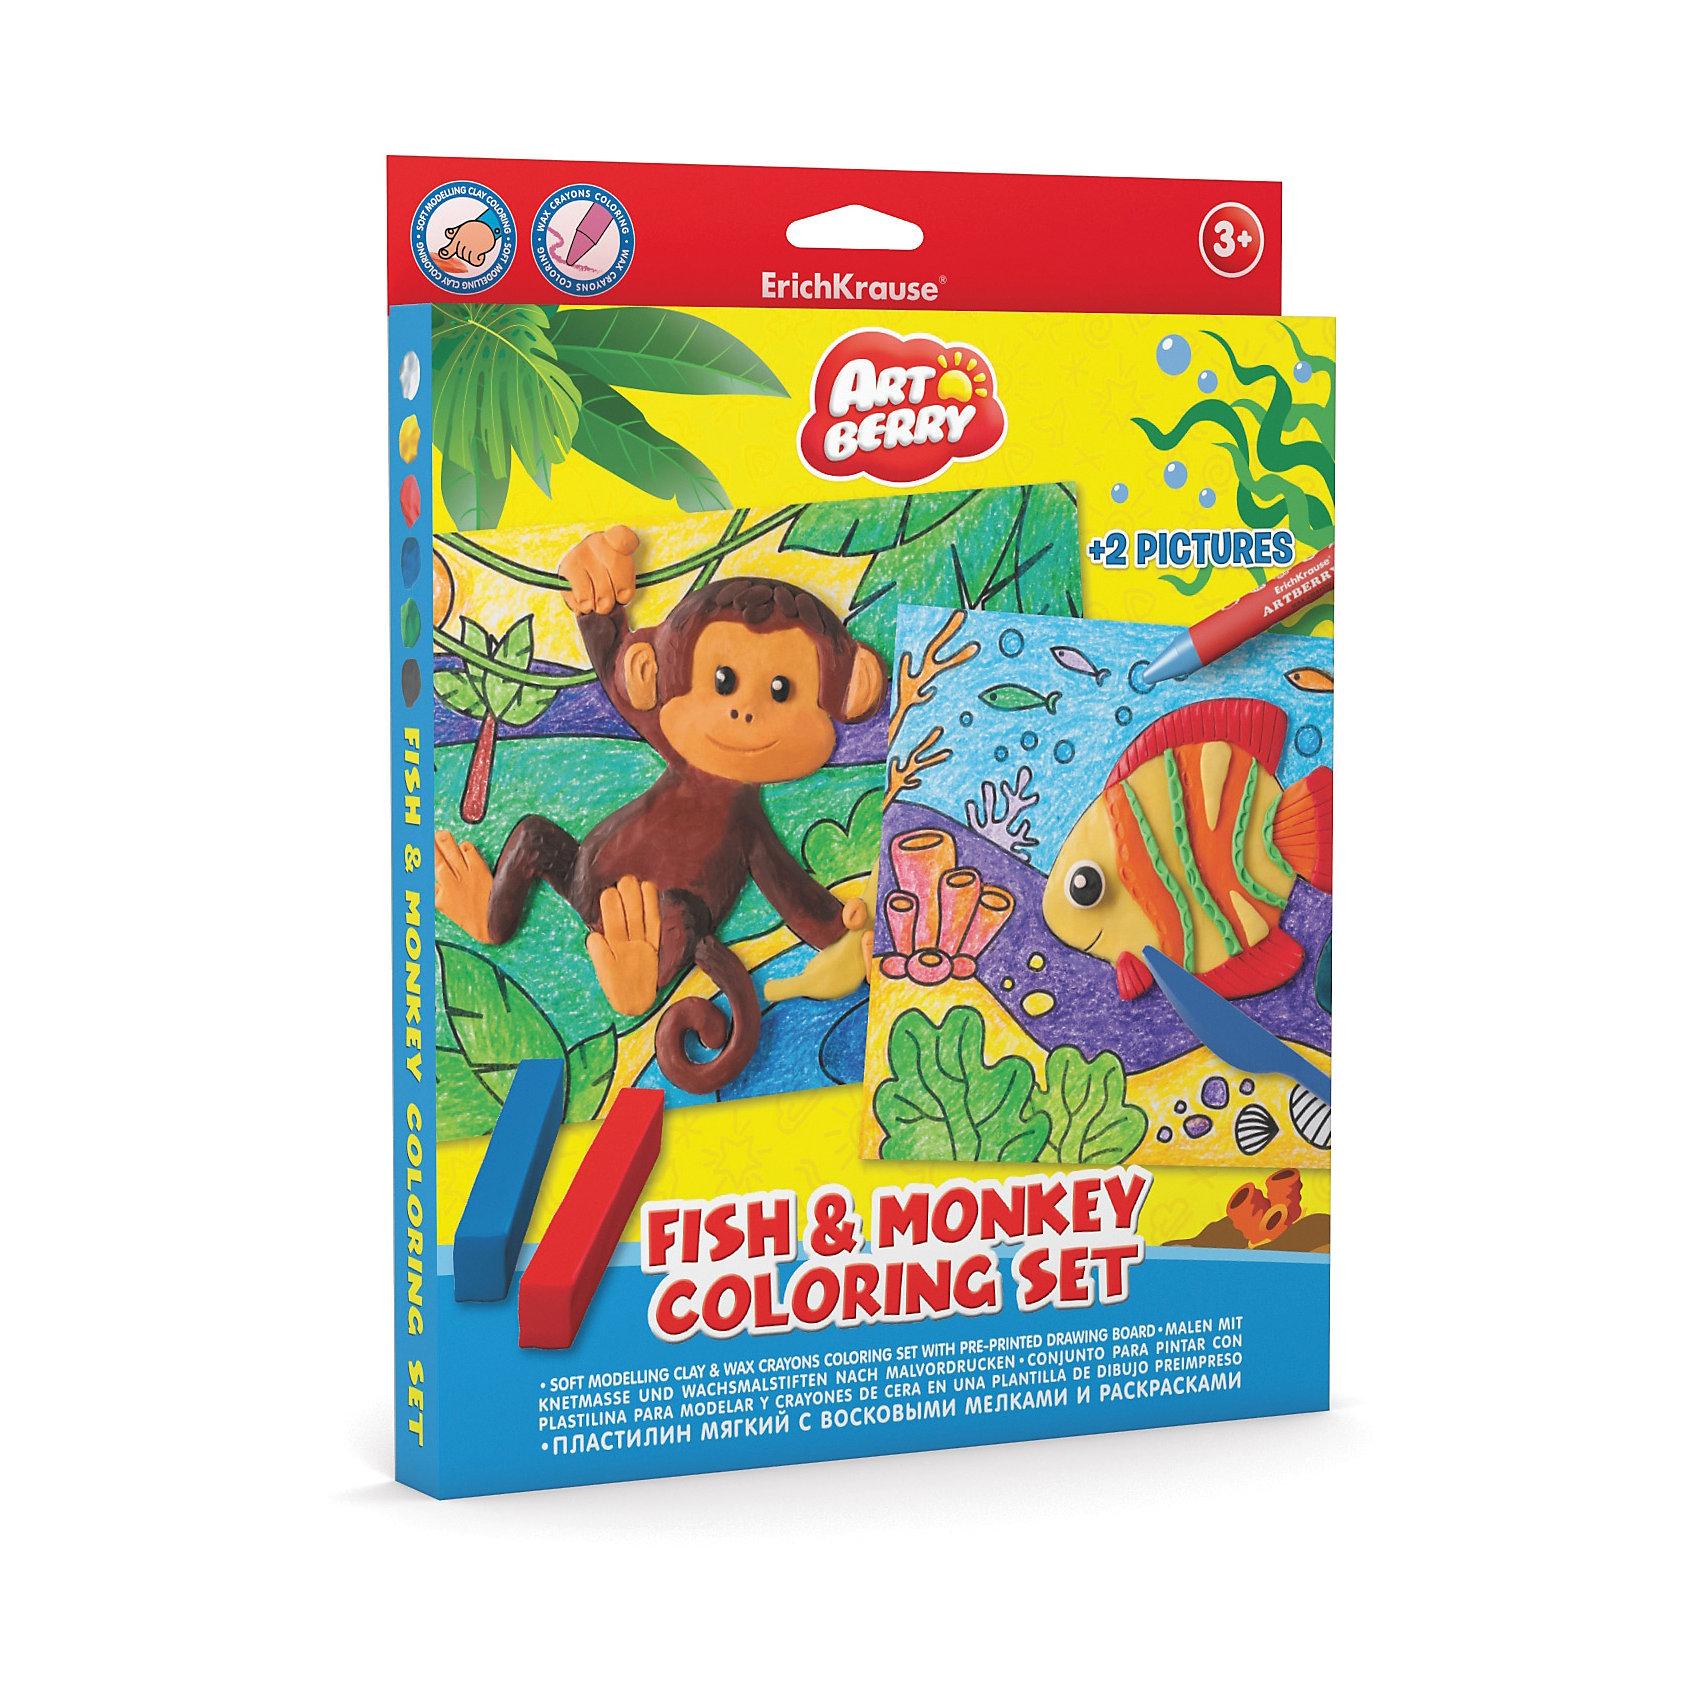 Набор для творчества Fish &amp; Monkey Coloring Set ArtberryРисование<br>Пластилин мягкий 6цв+восковые мелки 8цв+раскраски 2шт Fish &amp; Monkey Coloring Set Artberry<br><br>Ширина мм: 230<br>Глубина мм: 300<br>Высота мм: 25<br>Вес г: 272<br>Возраст от месяцев: 60<br>Возраст до месяцев: 216<br>Пол: Унисекс<br>Возраст: Детский<br>SKU: 5409352